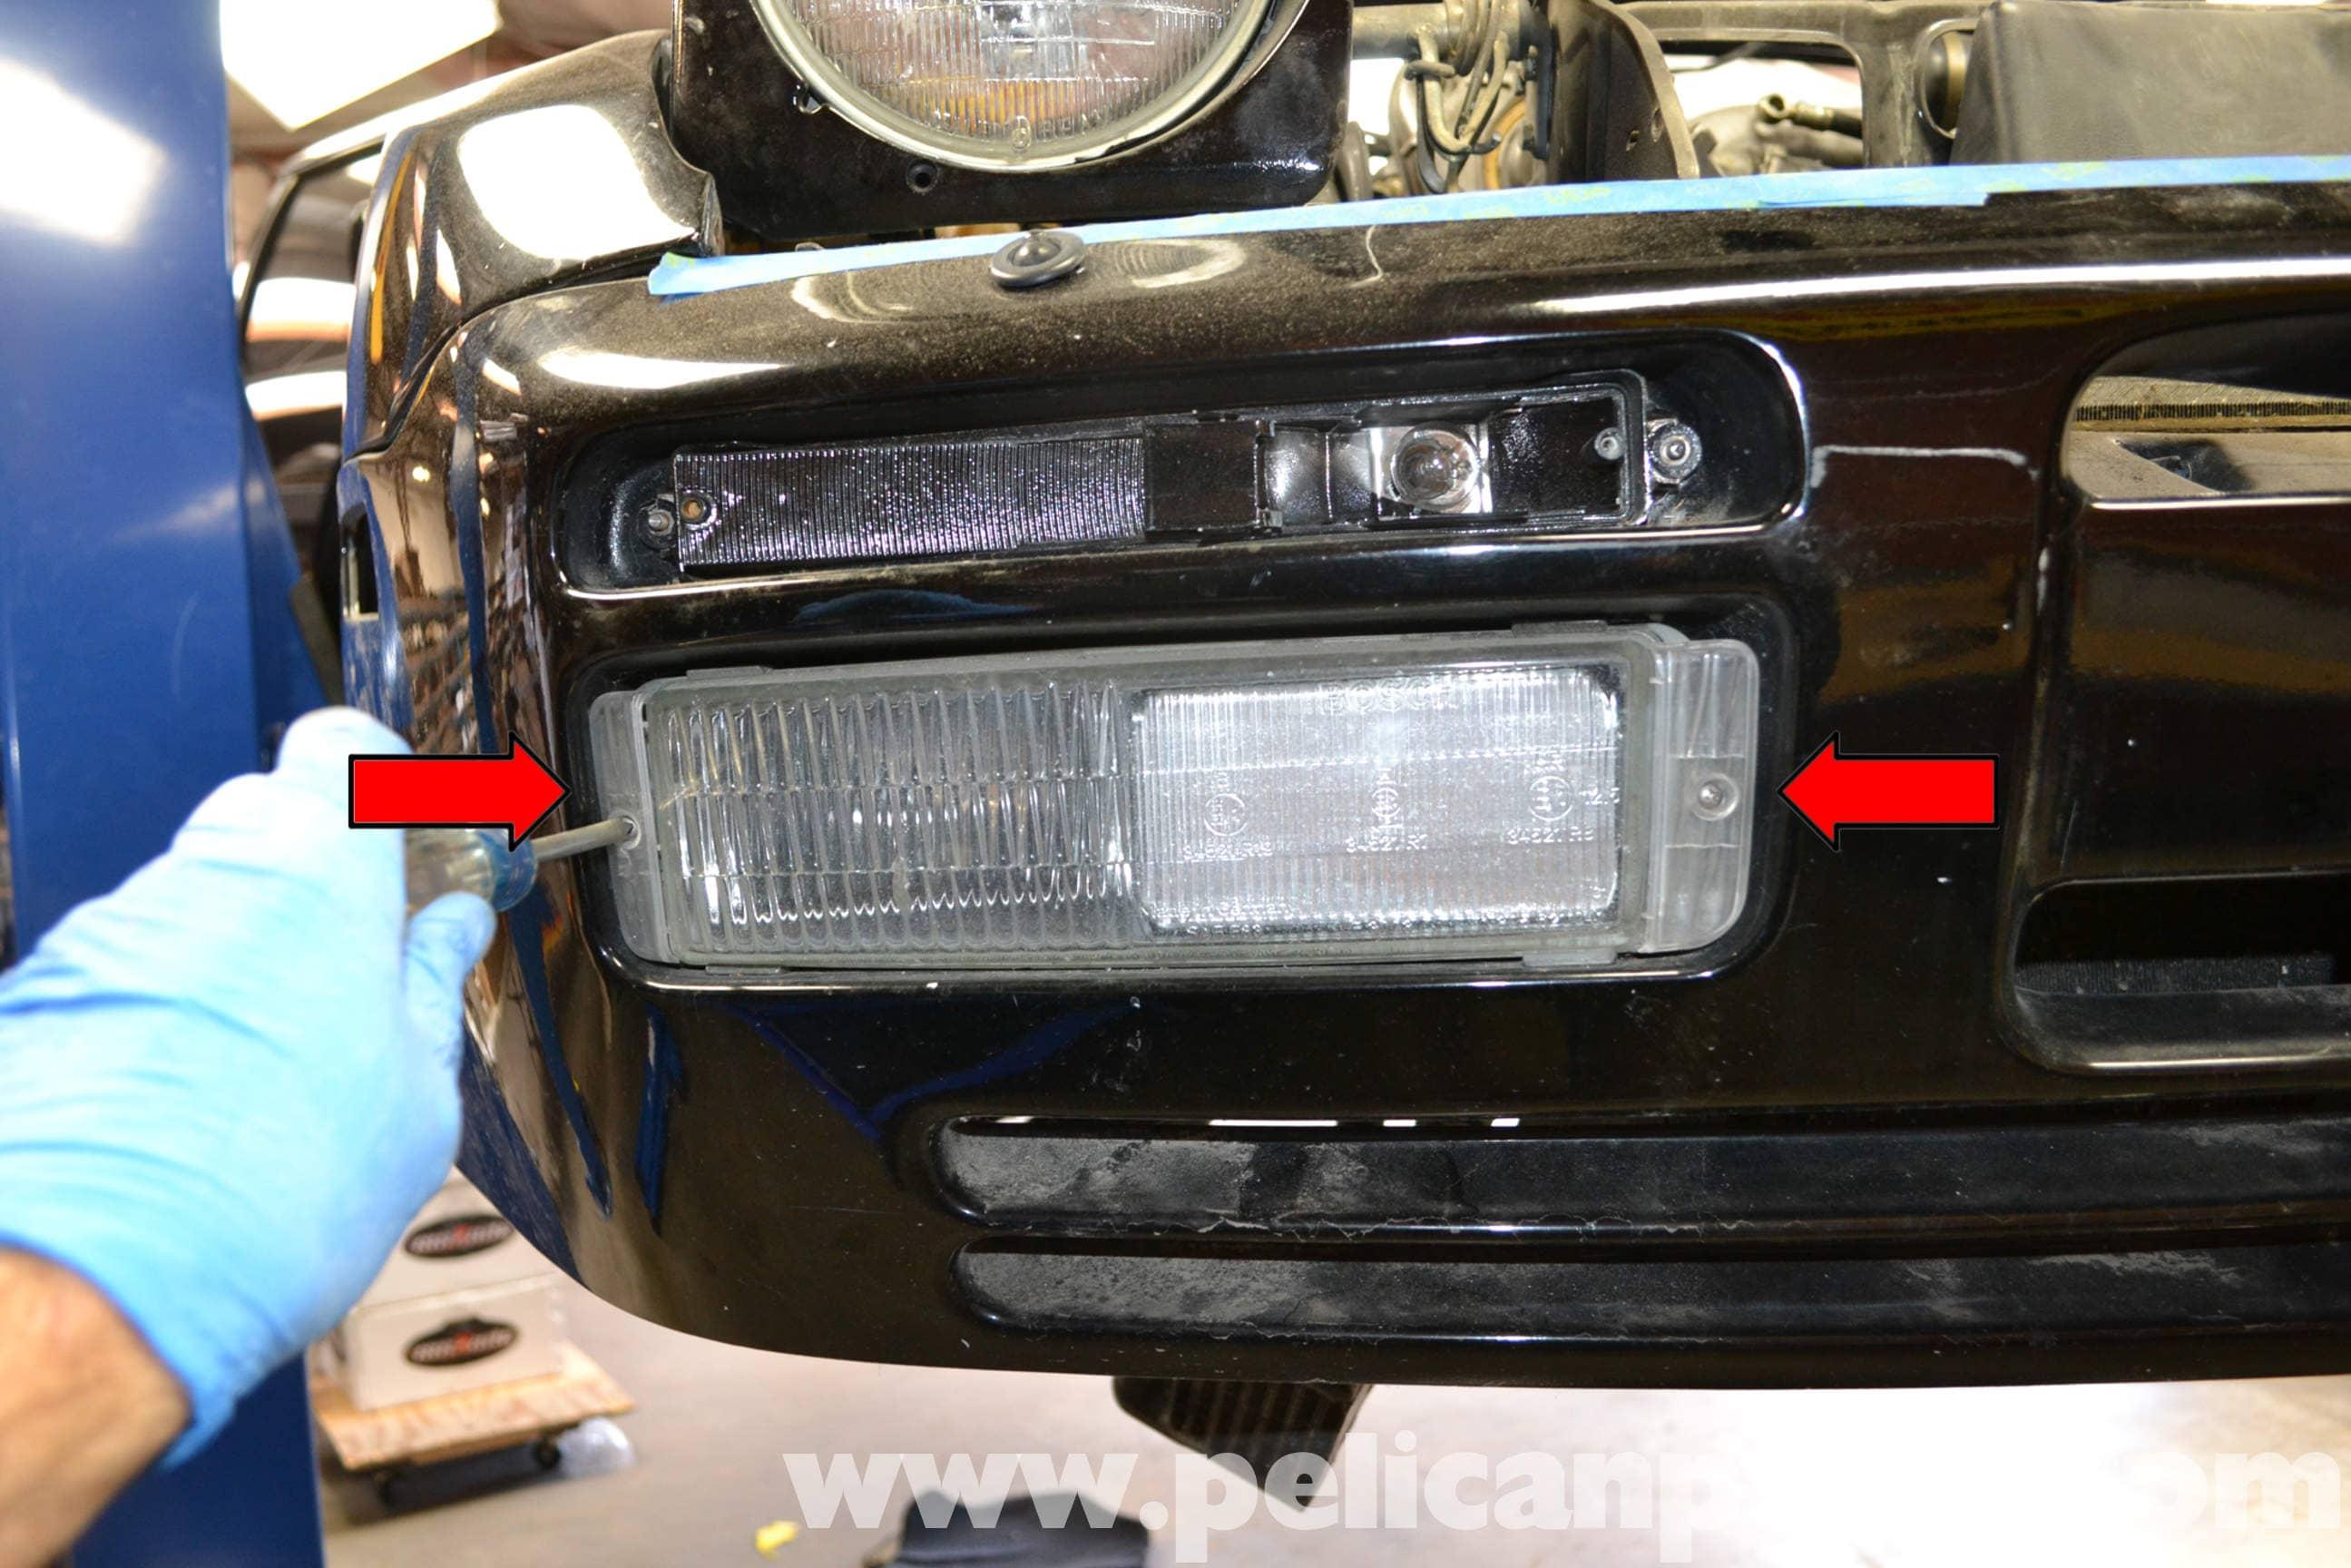 Porsche 944 Turbo Exterior Light Bulb Replacement 1986 1991 Pelican Parts Diy Maintenance